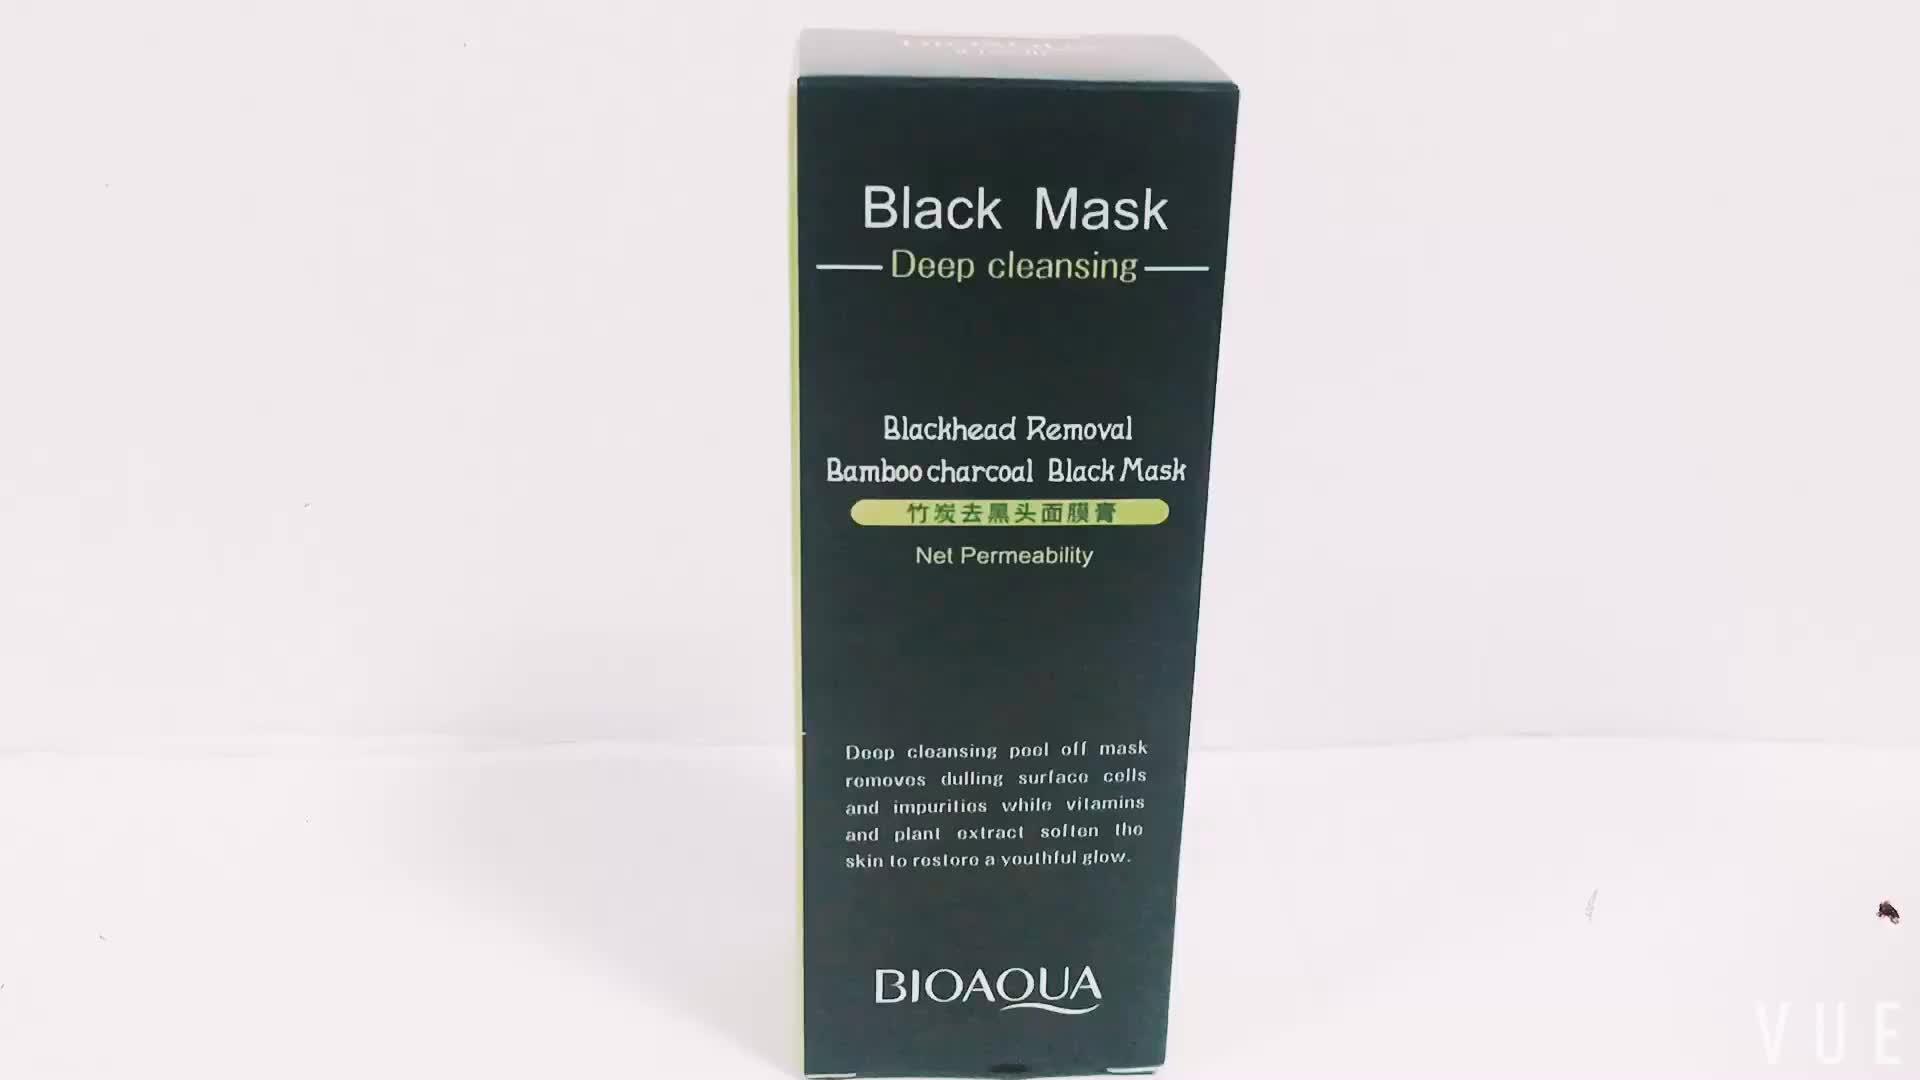 BIOAQUA Black peel off facial mask blackheads remover shrinking pores